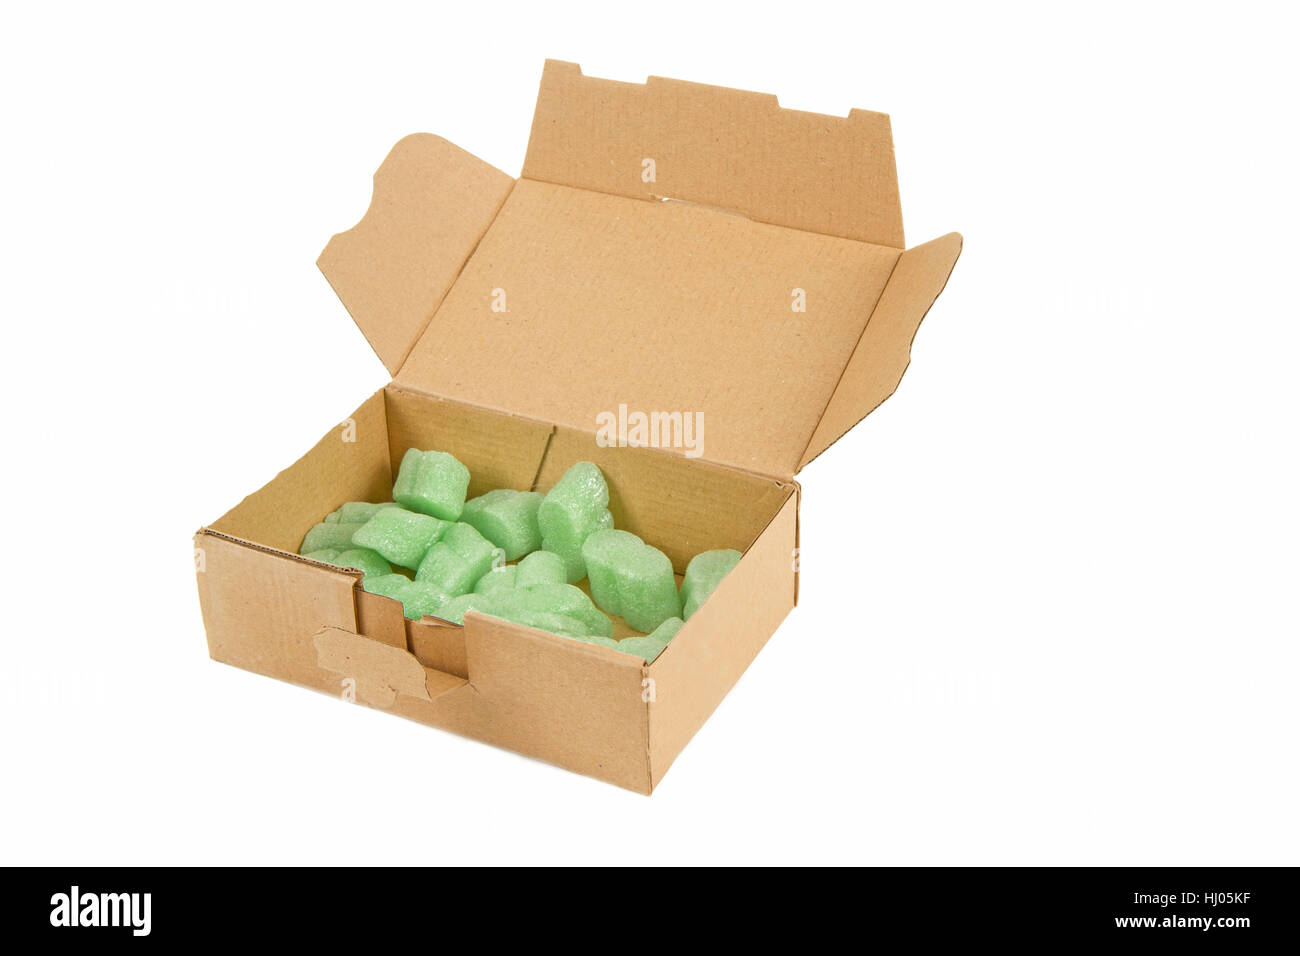 cardboard box, cardboard, carton, packing, packaging, box, eco, environment, Stock Photo